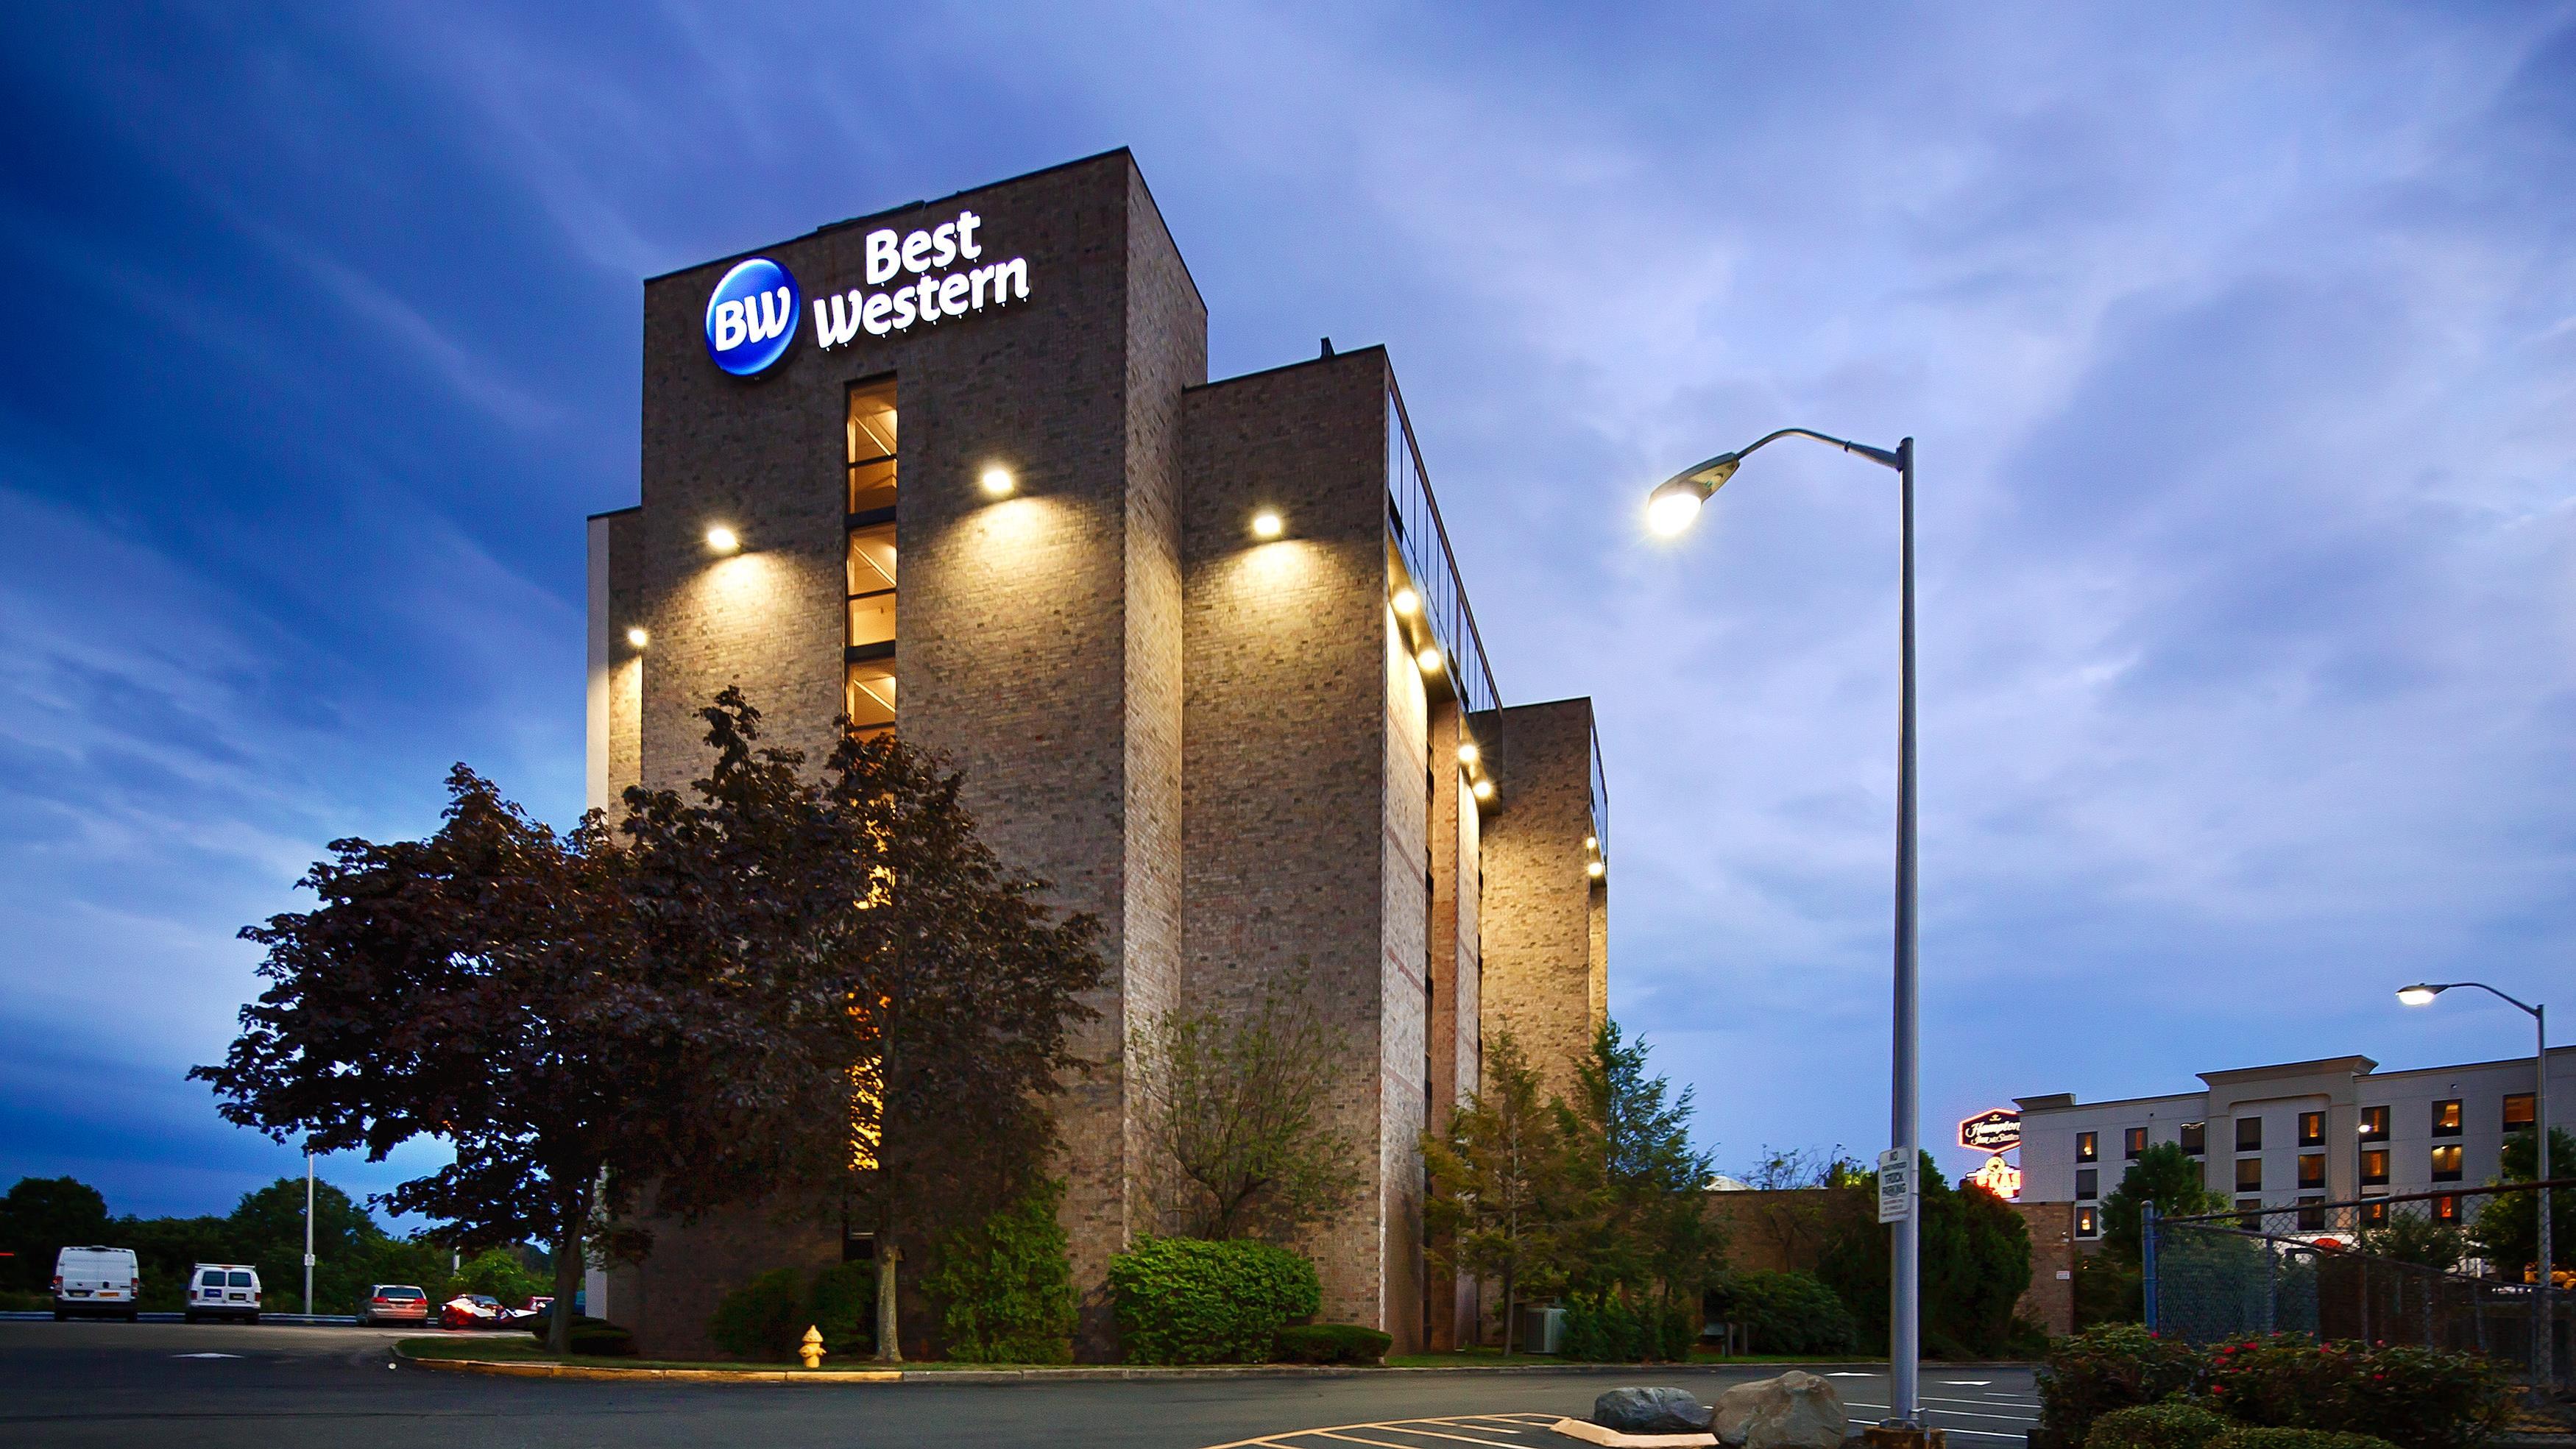 Best Western Hotel In West Haven Ct